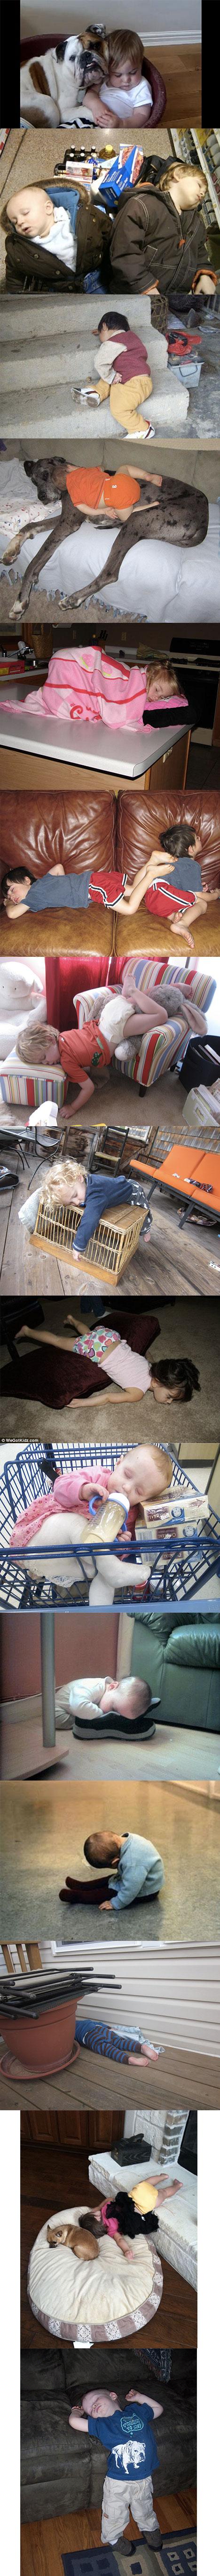 lieux-insolites-sieste-bebe